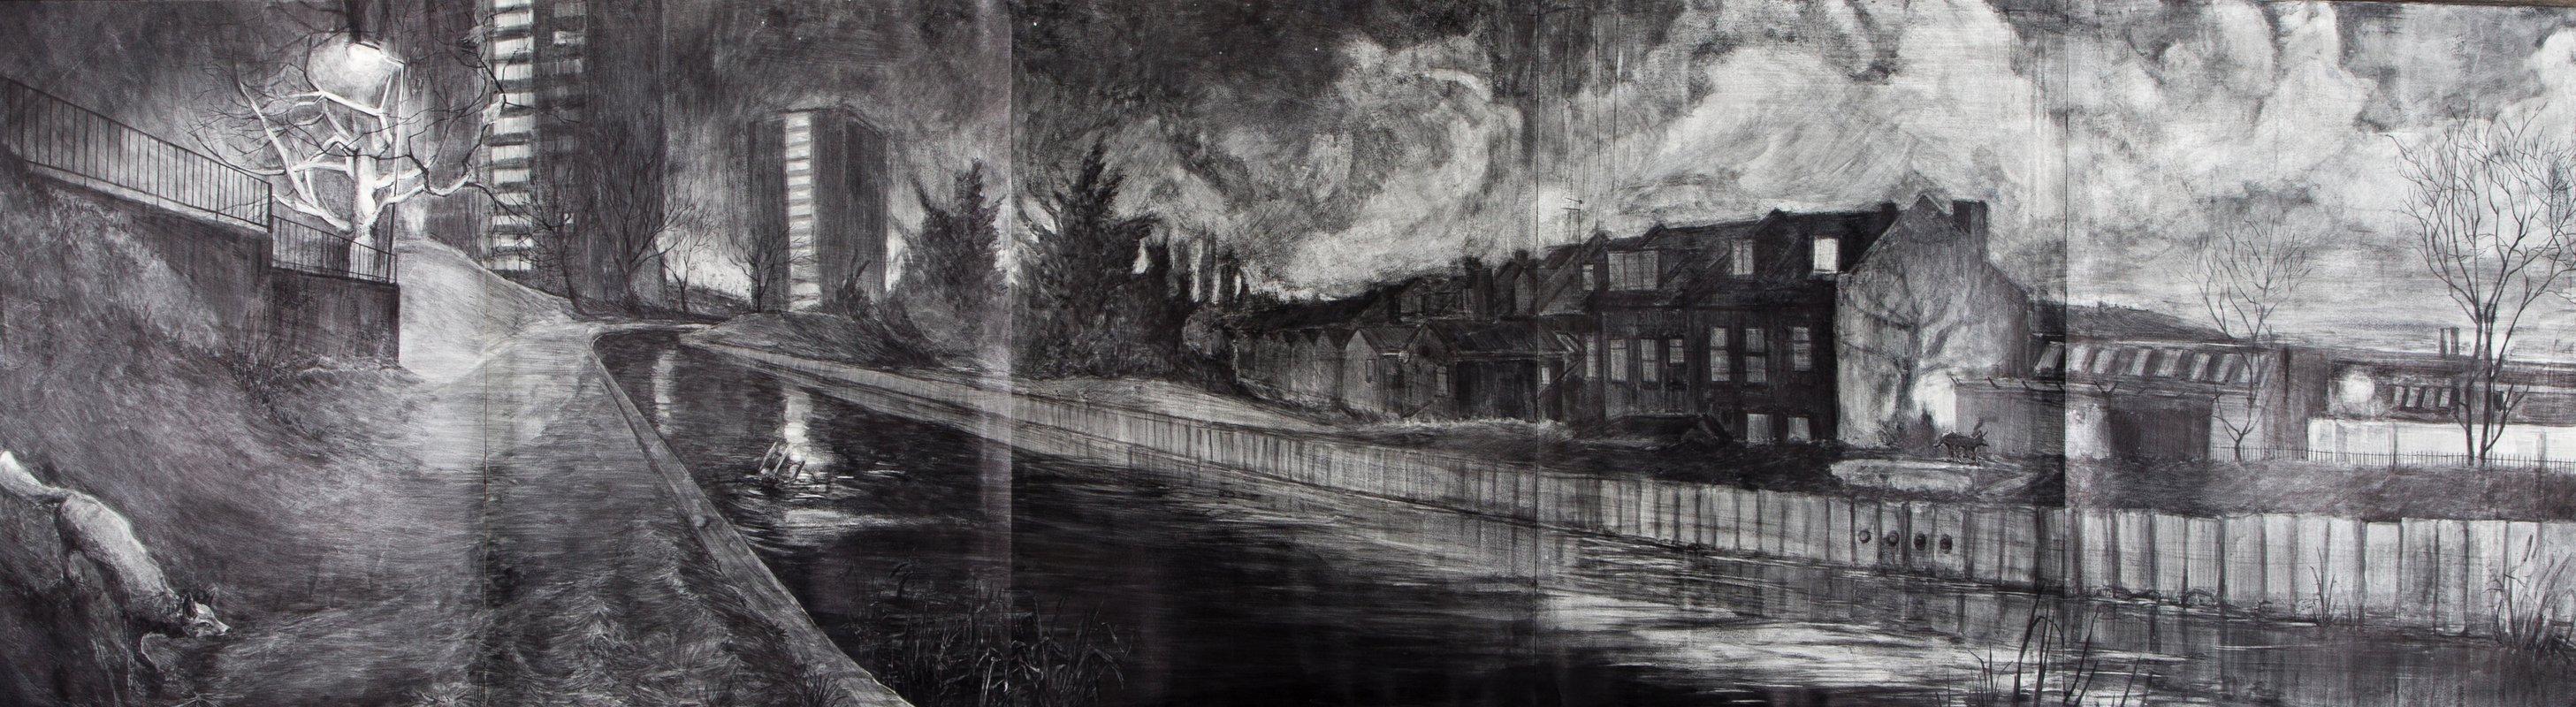 Canal Nocturne<span>Copyright Geraint Ross Evans</span>